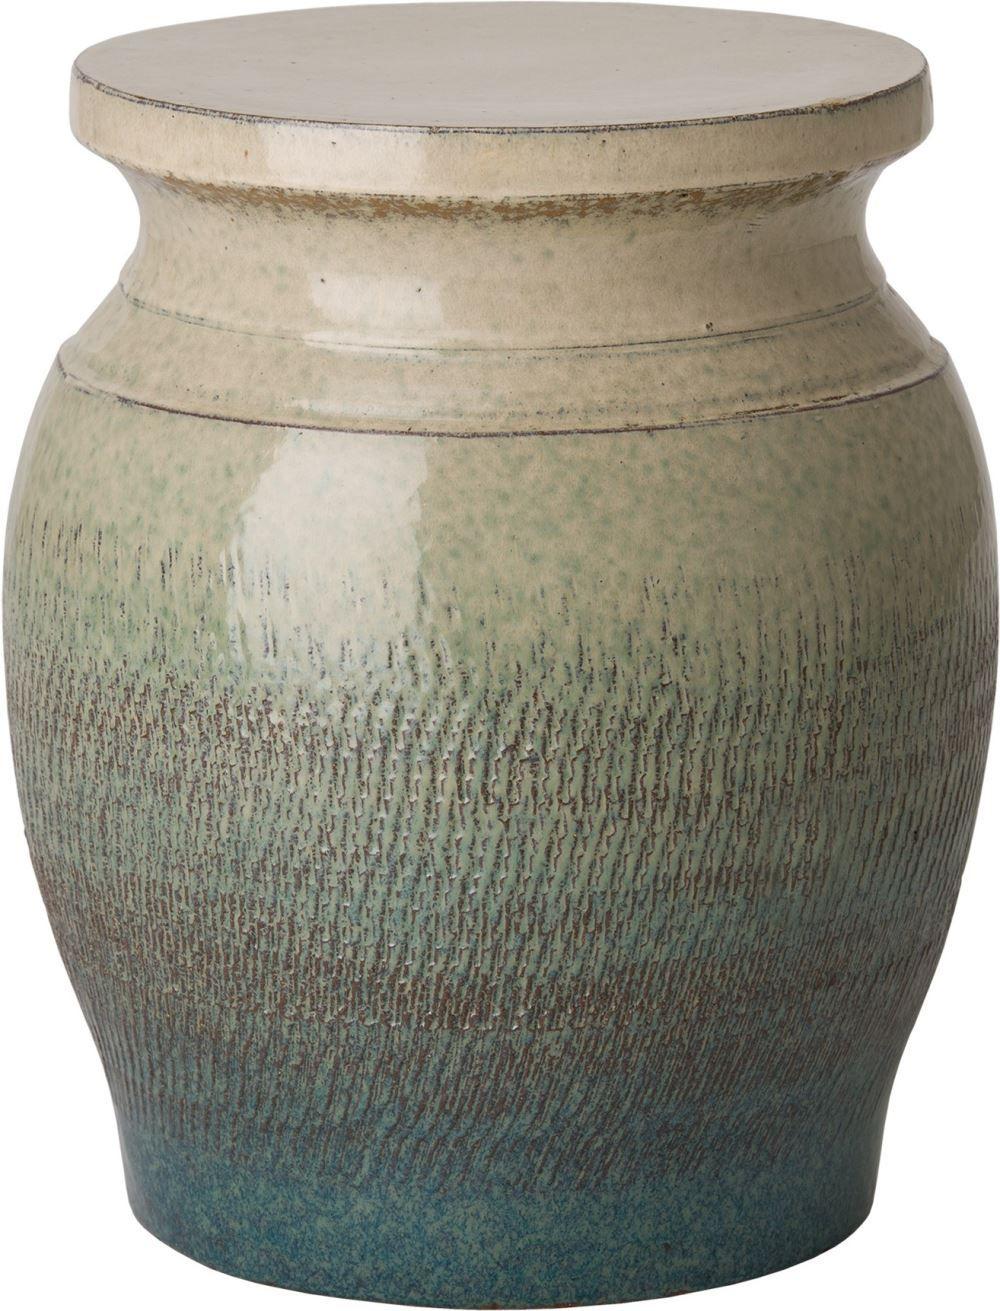 Koji Garden Stool/Table With A Bayside Green Glaze – Em 106 With Aloysius Ceramic Garden Stools (View 14 of 25)